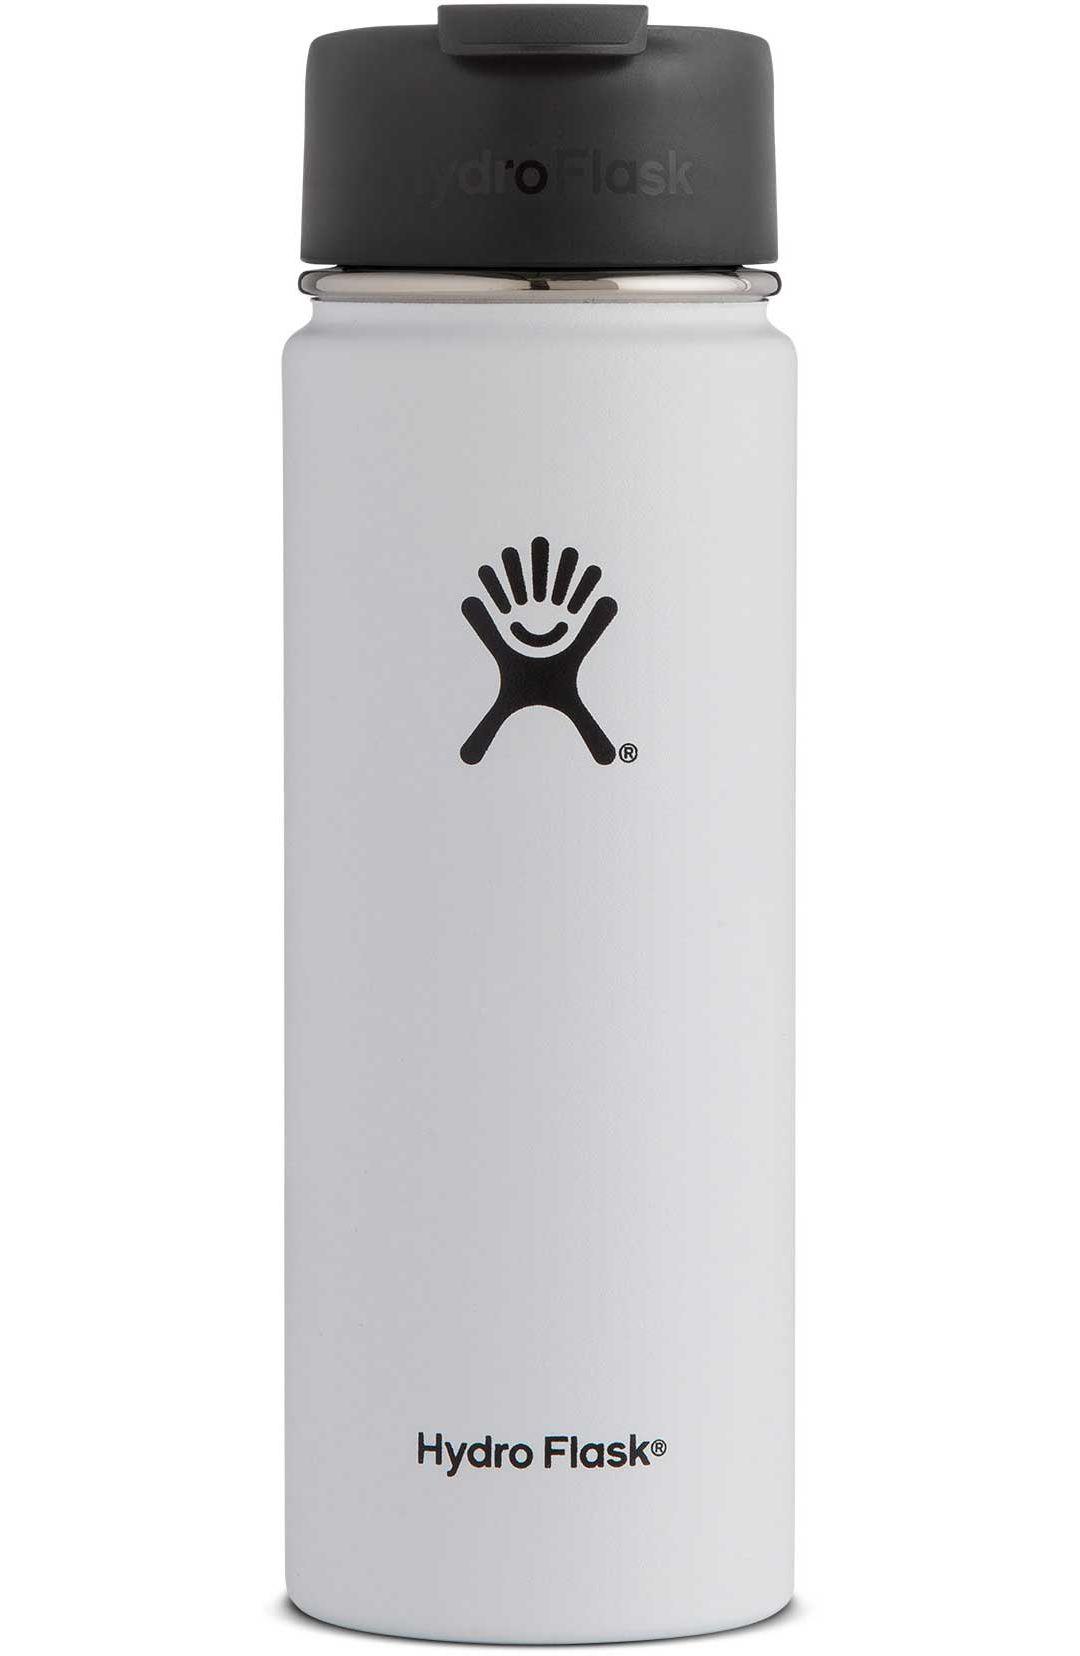 66d4a63962 Hydro Flask Flip Top 20 oz. Bottle | DICK'S Sporting Goods